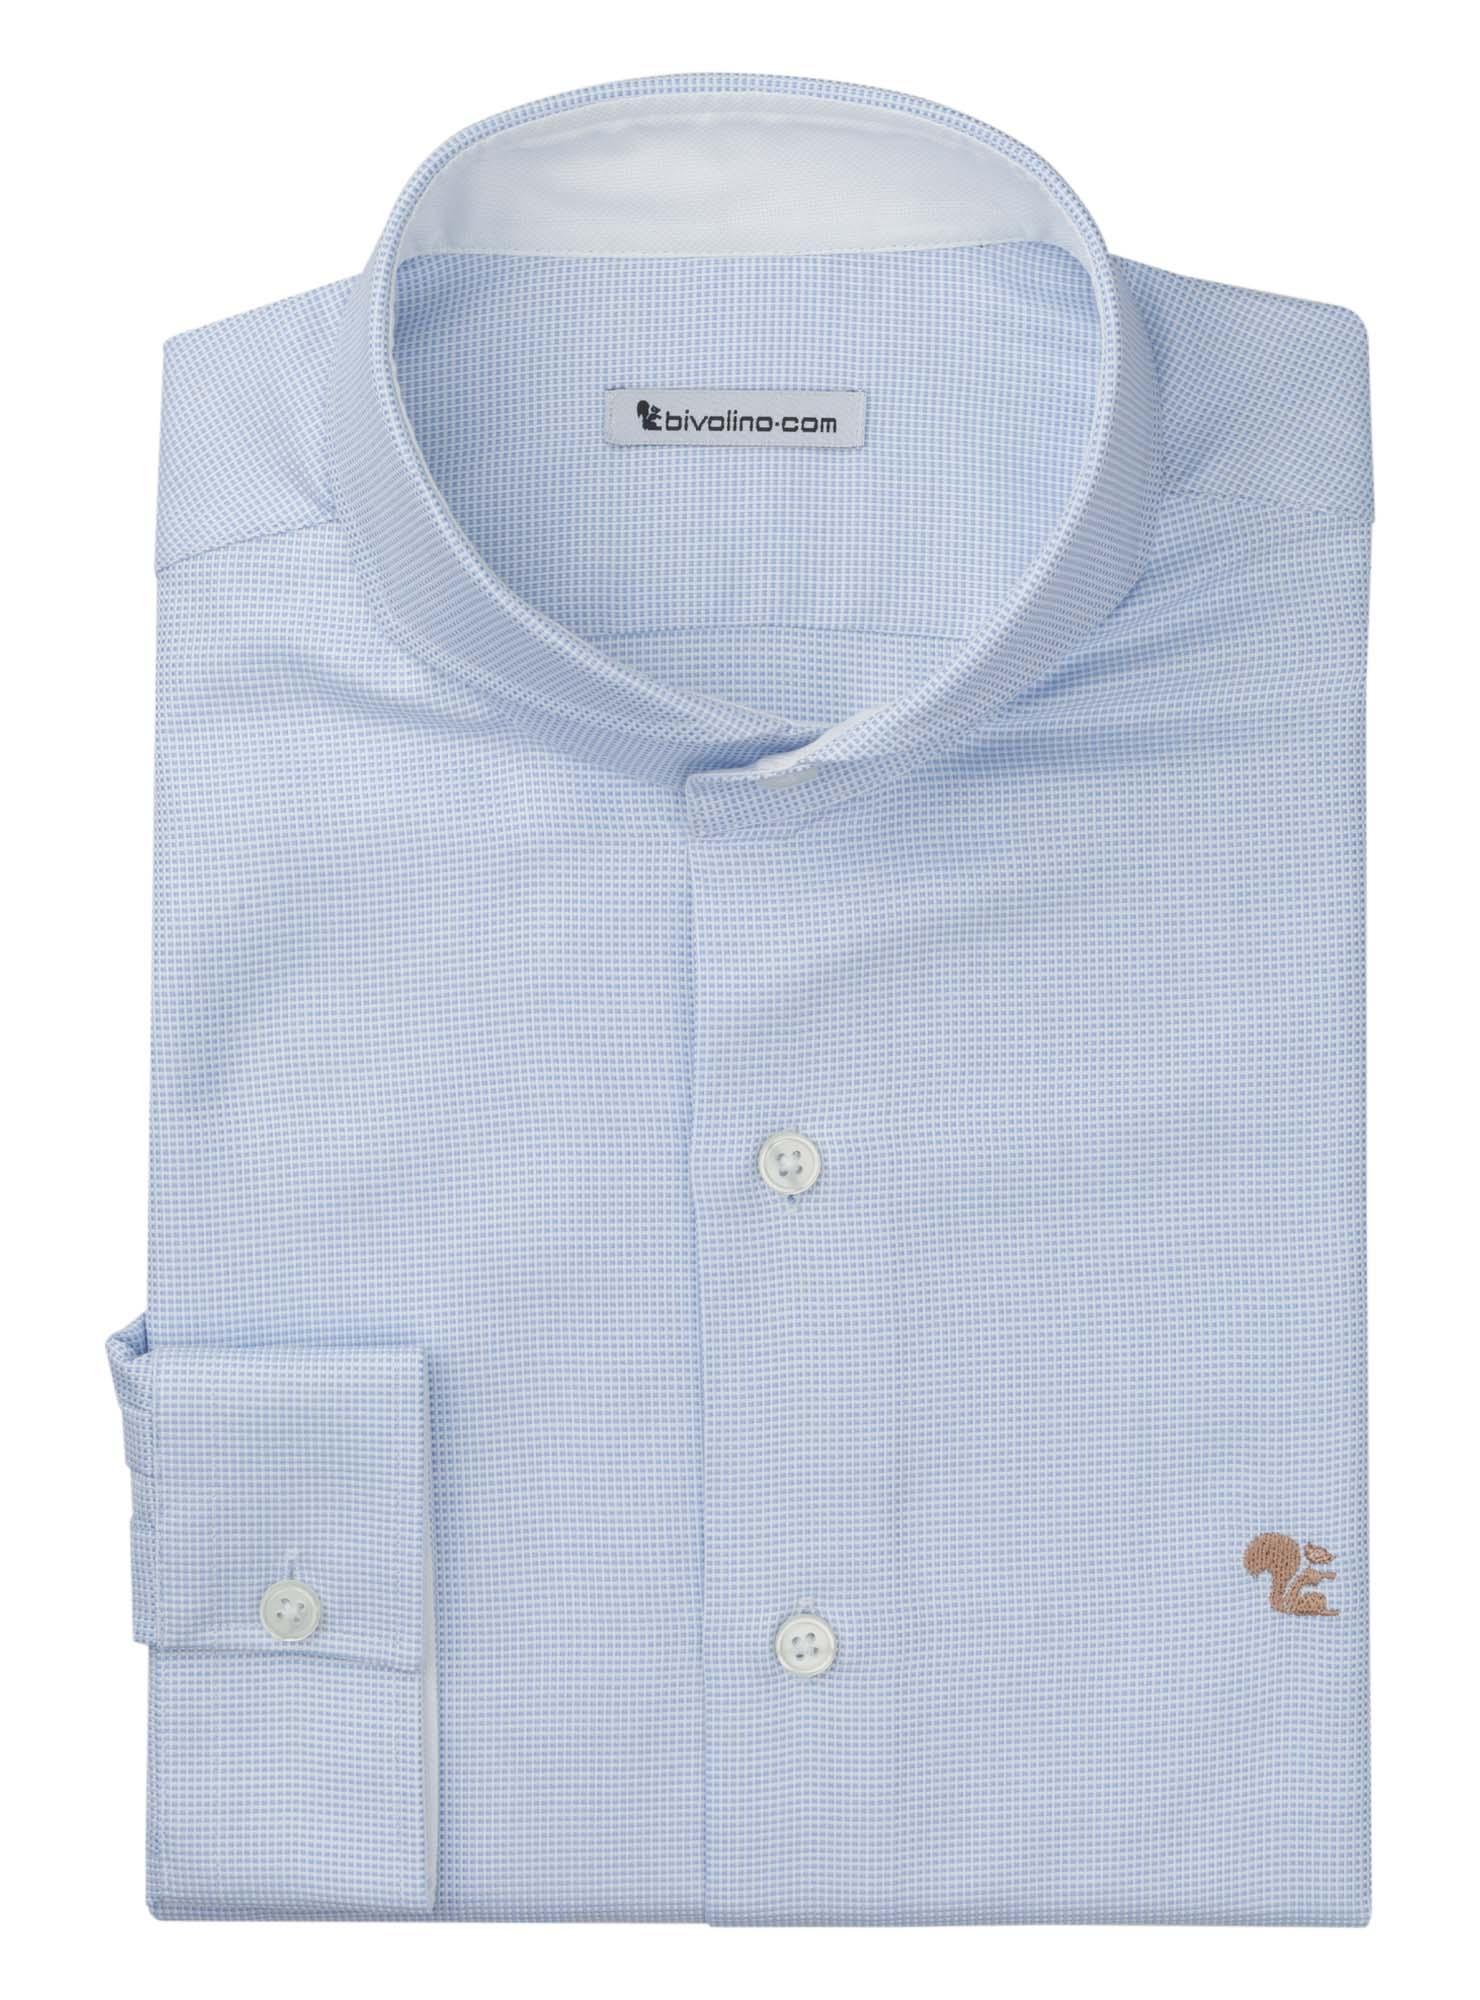 BIELLA - chemise homme Oxford bleu double retors - ROYAL PANAMA 1